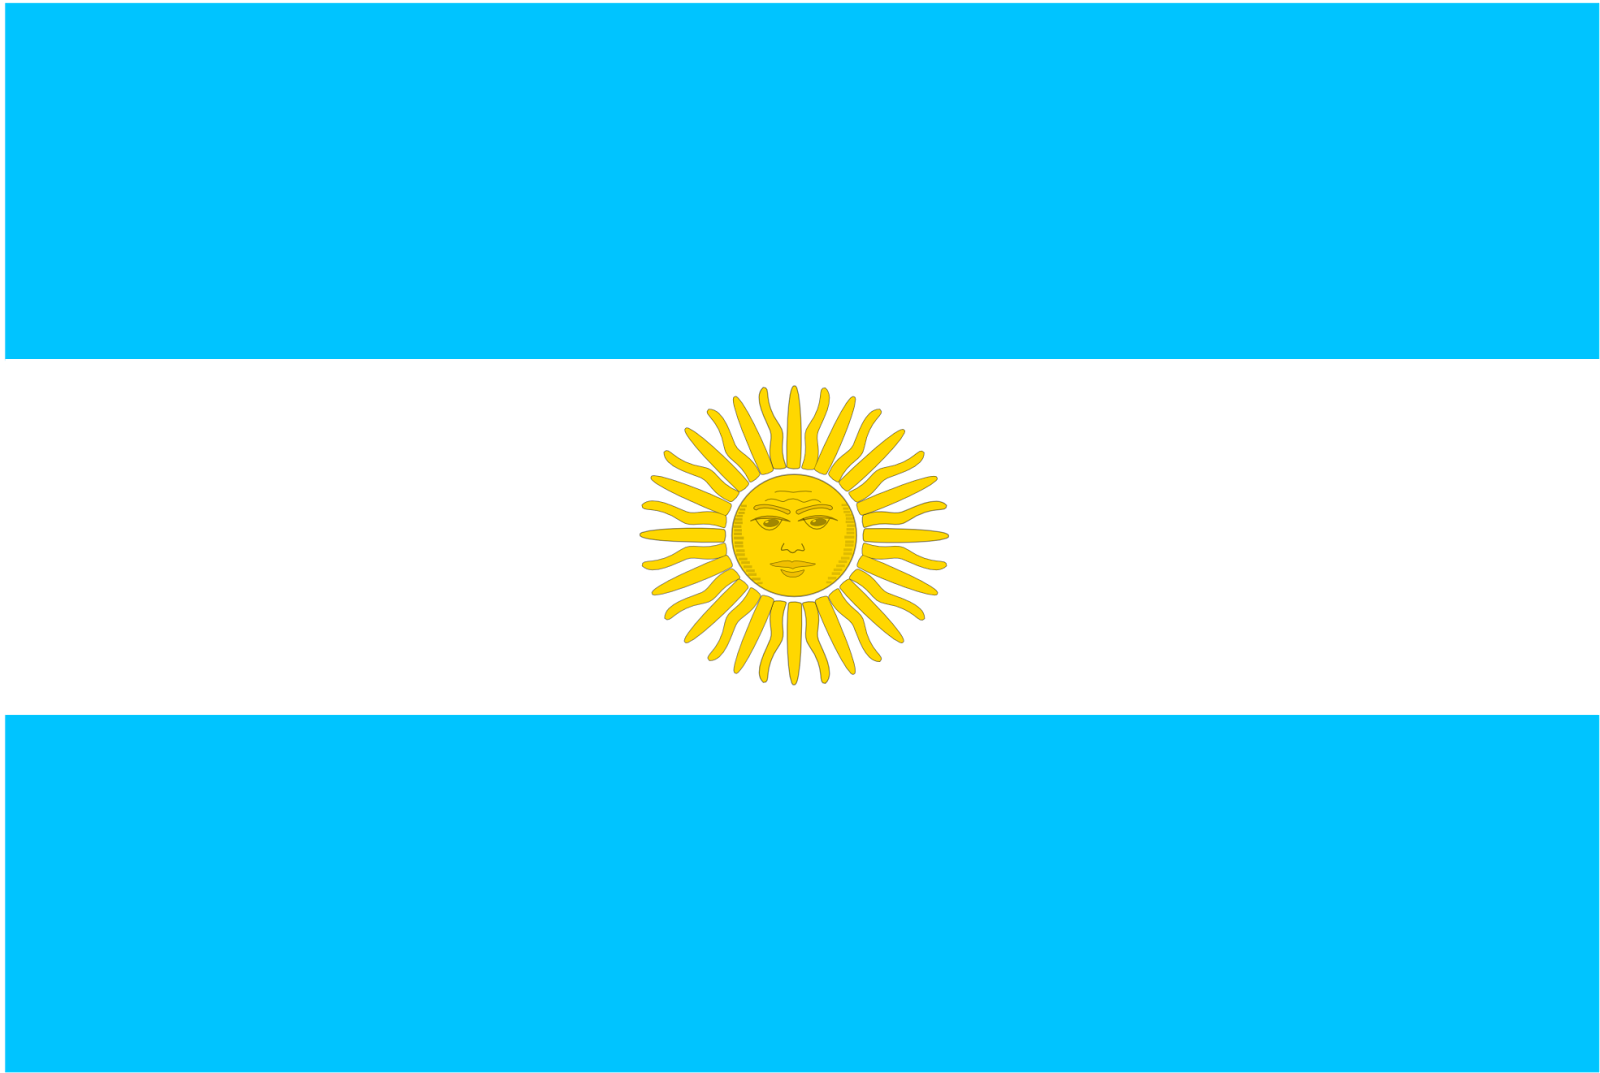 коровьих аргентина картинки флаг и герб покрыт ярко-белыми